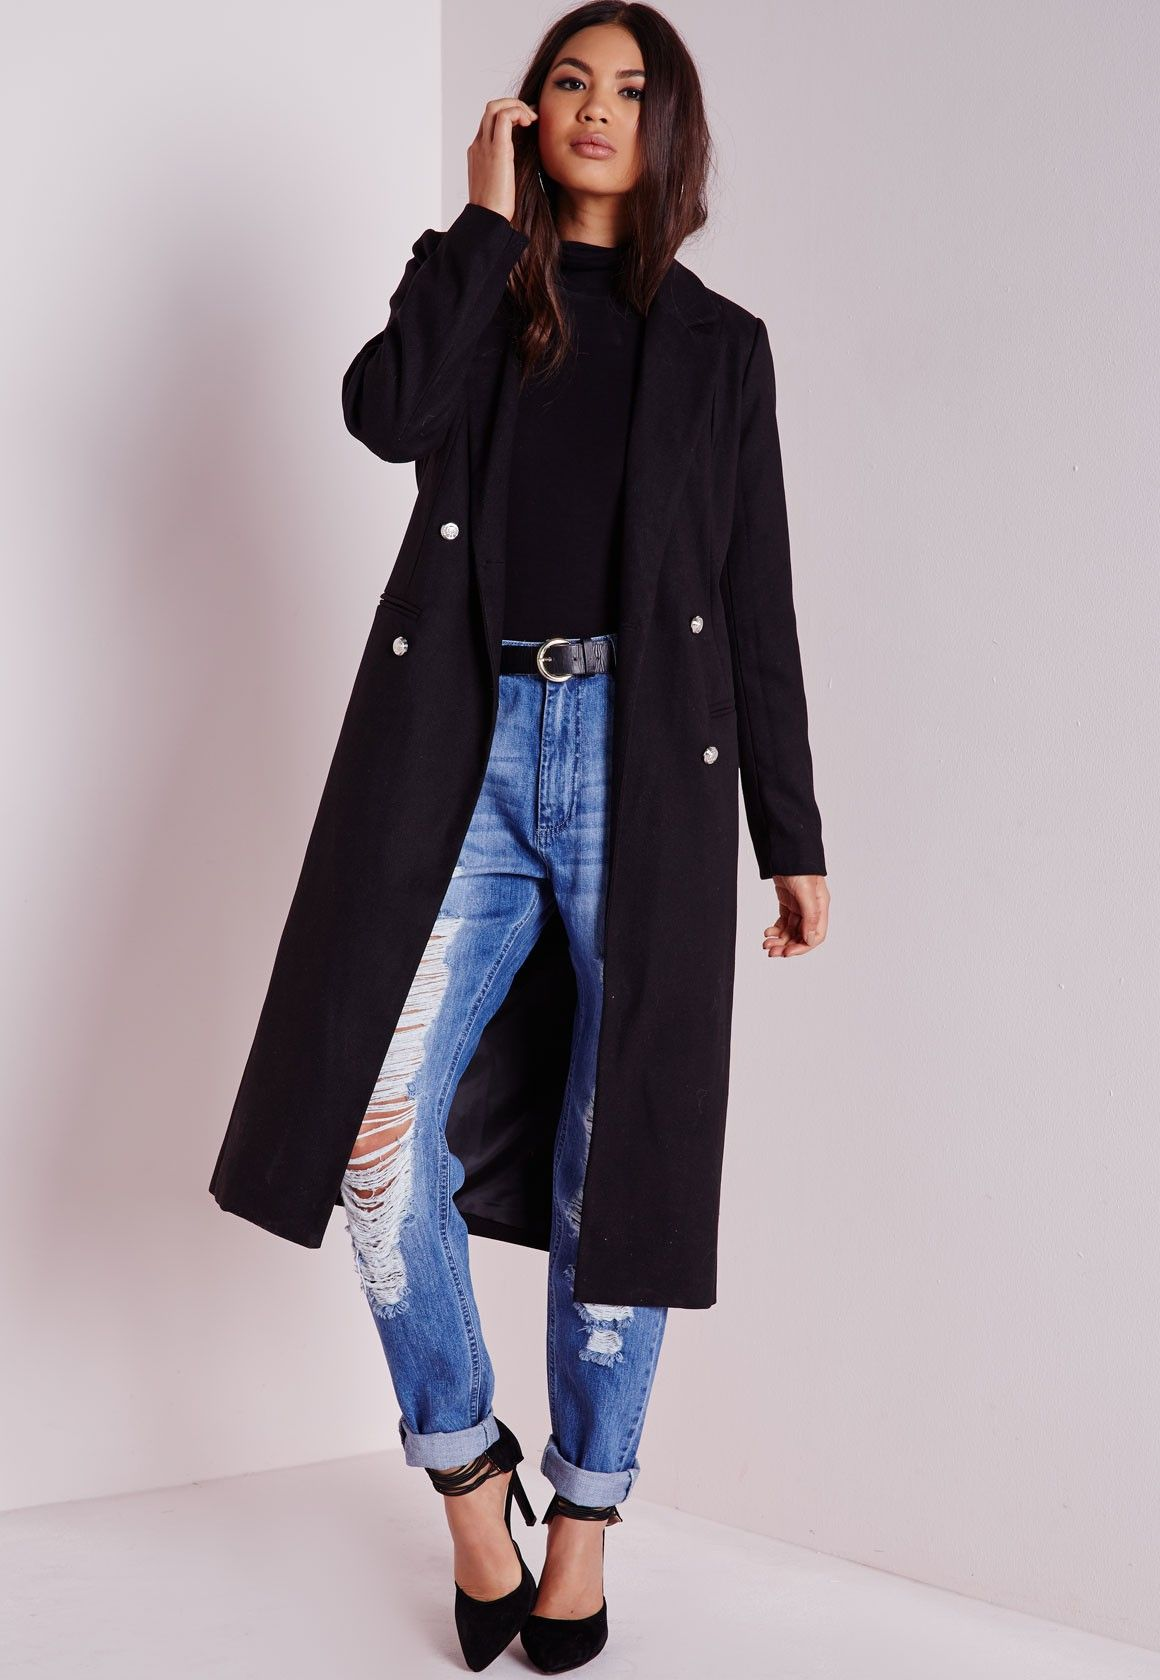 Winter fashion coat ideas. Military, simple black or a fur coat ...